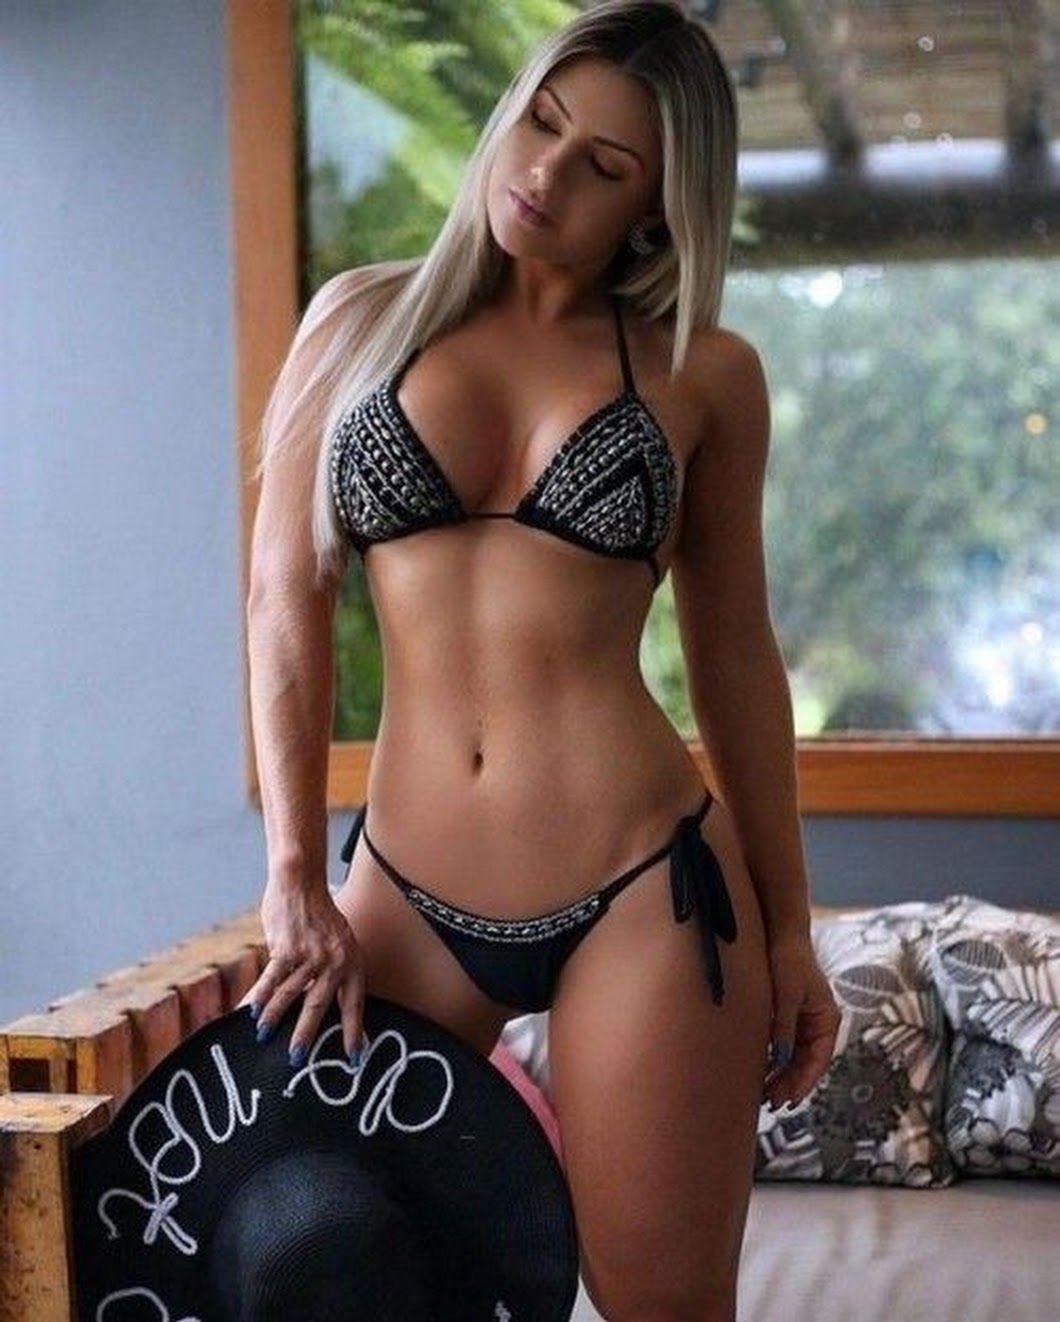 37ad06ac3458 Pour some sugar on me.... | hot chic | Bikinis, Bikini girls, Sexy